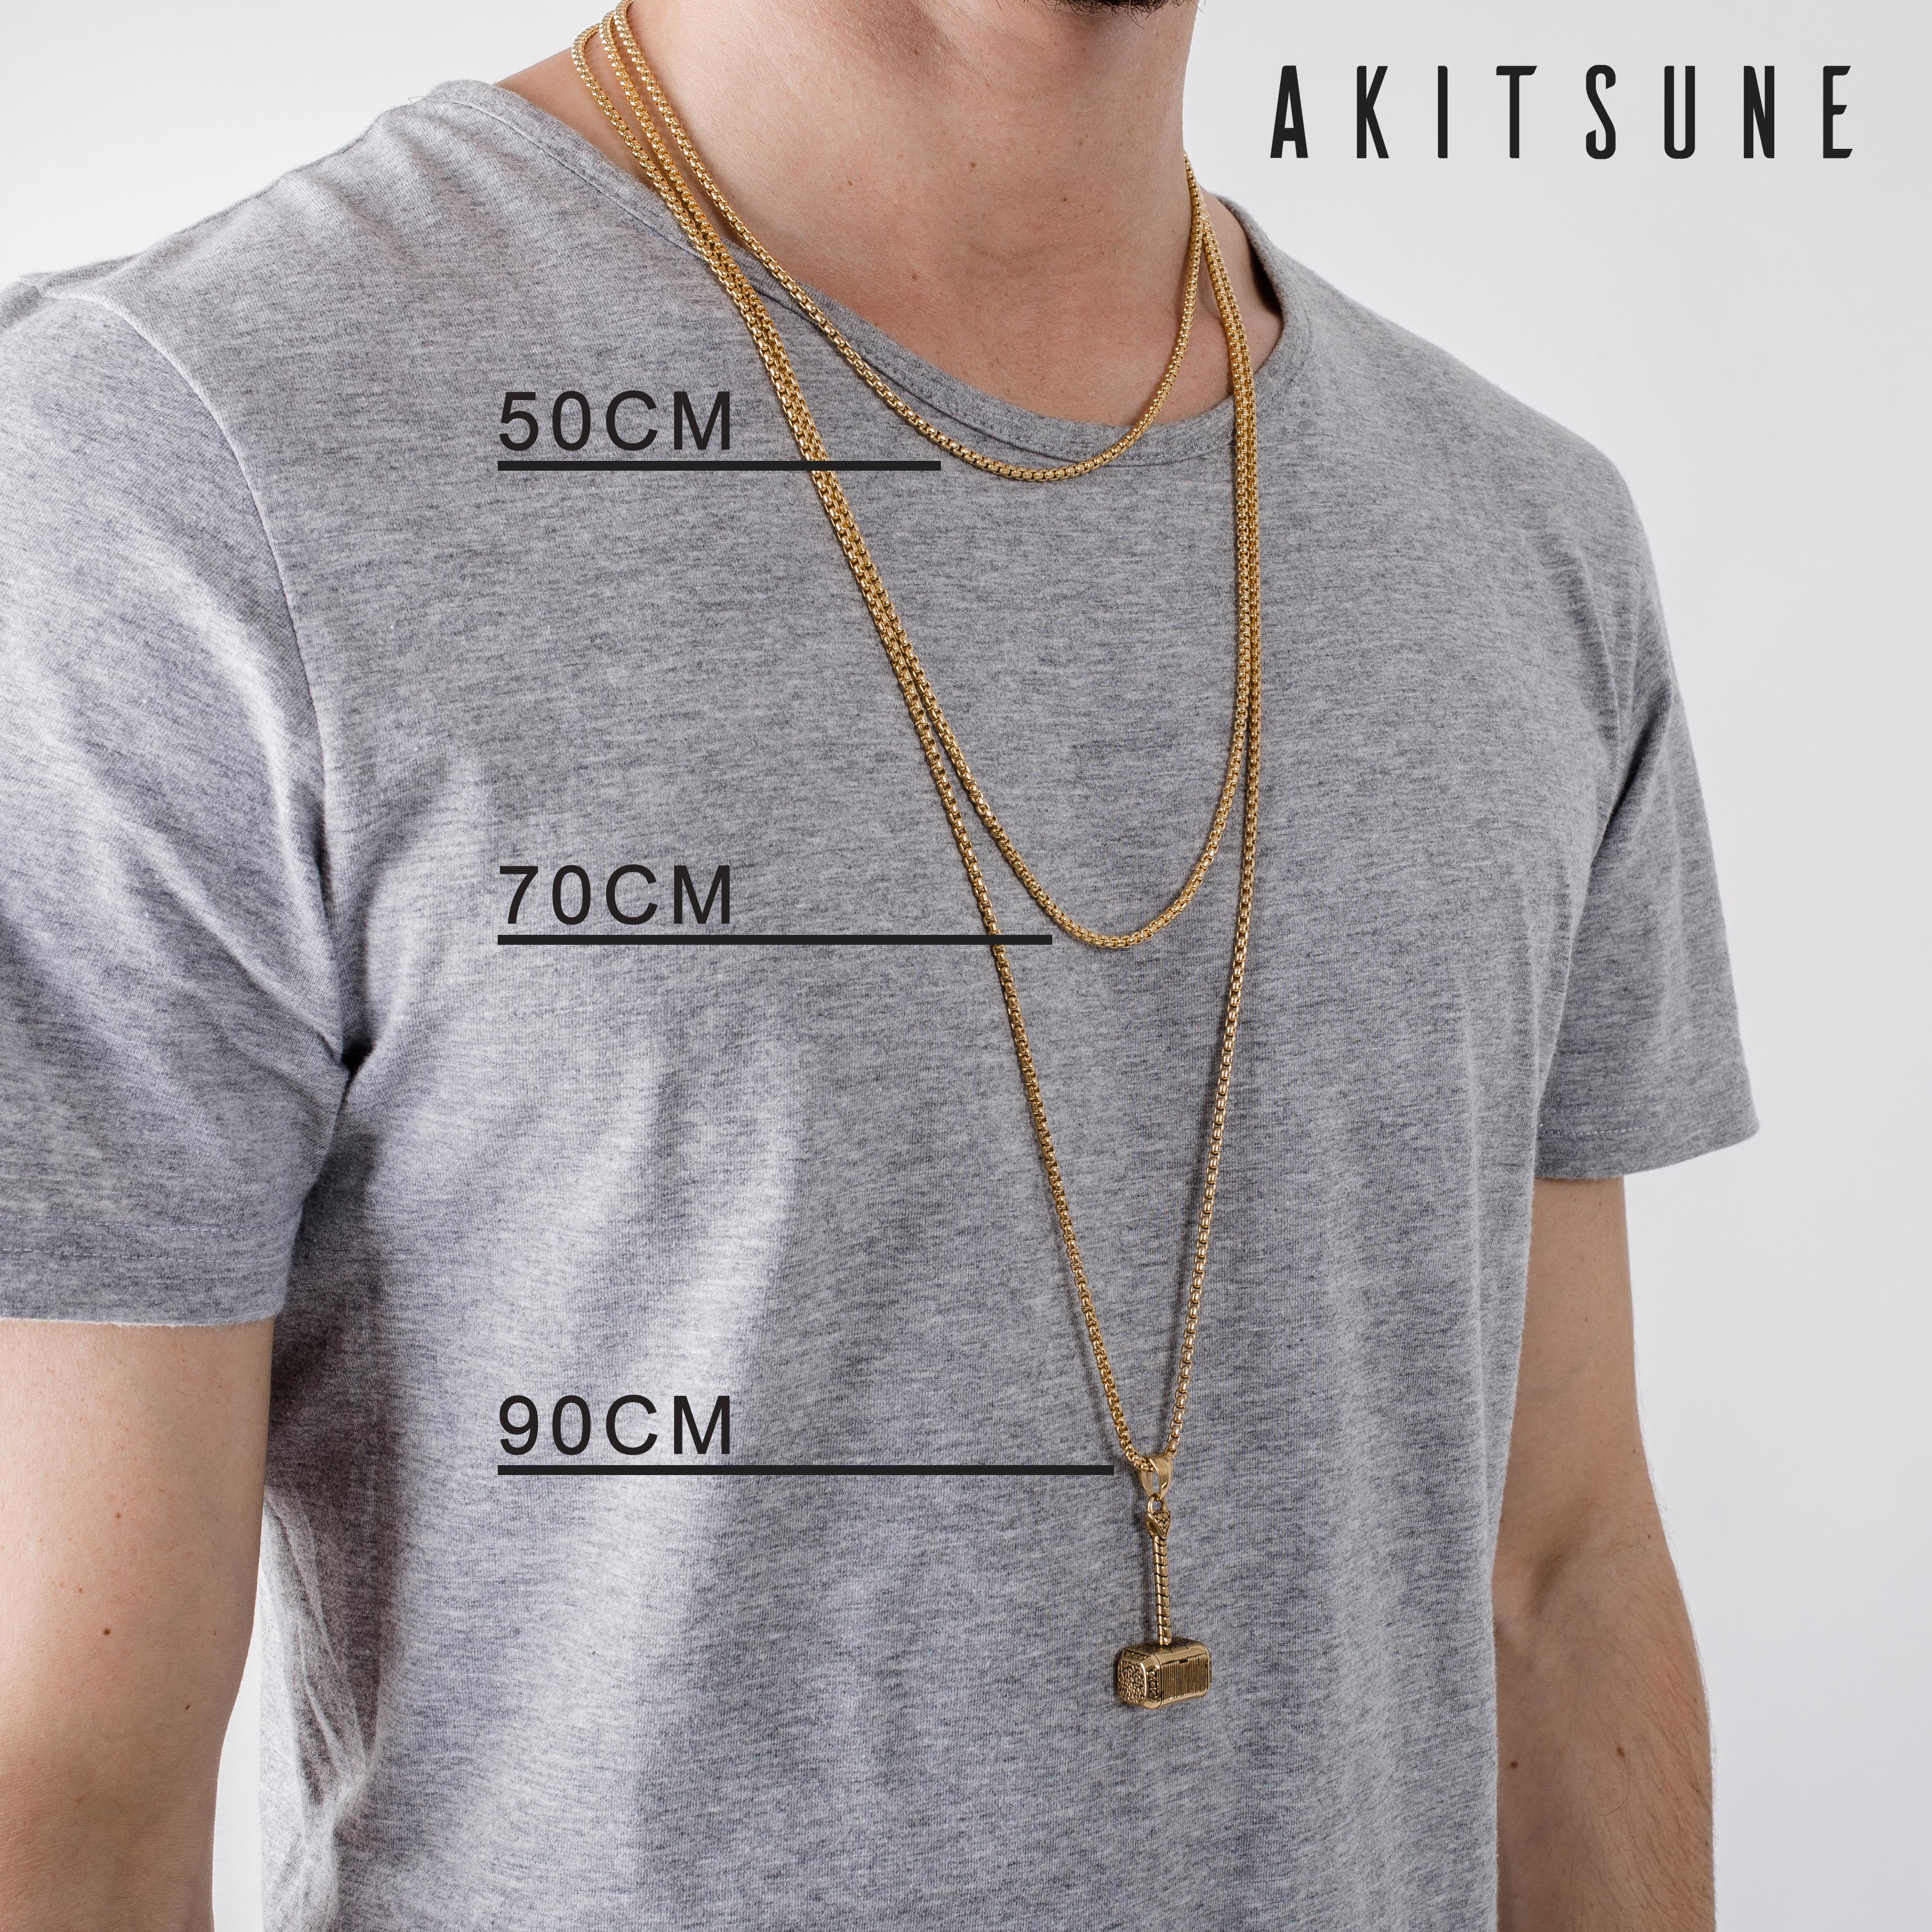 Akitsune-Chain-Length04hhSbIofyBhQ